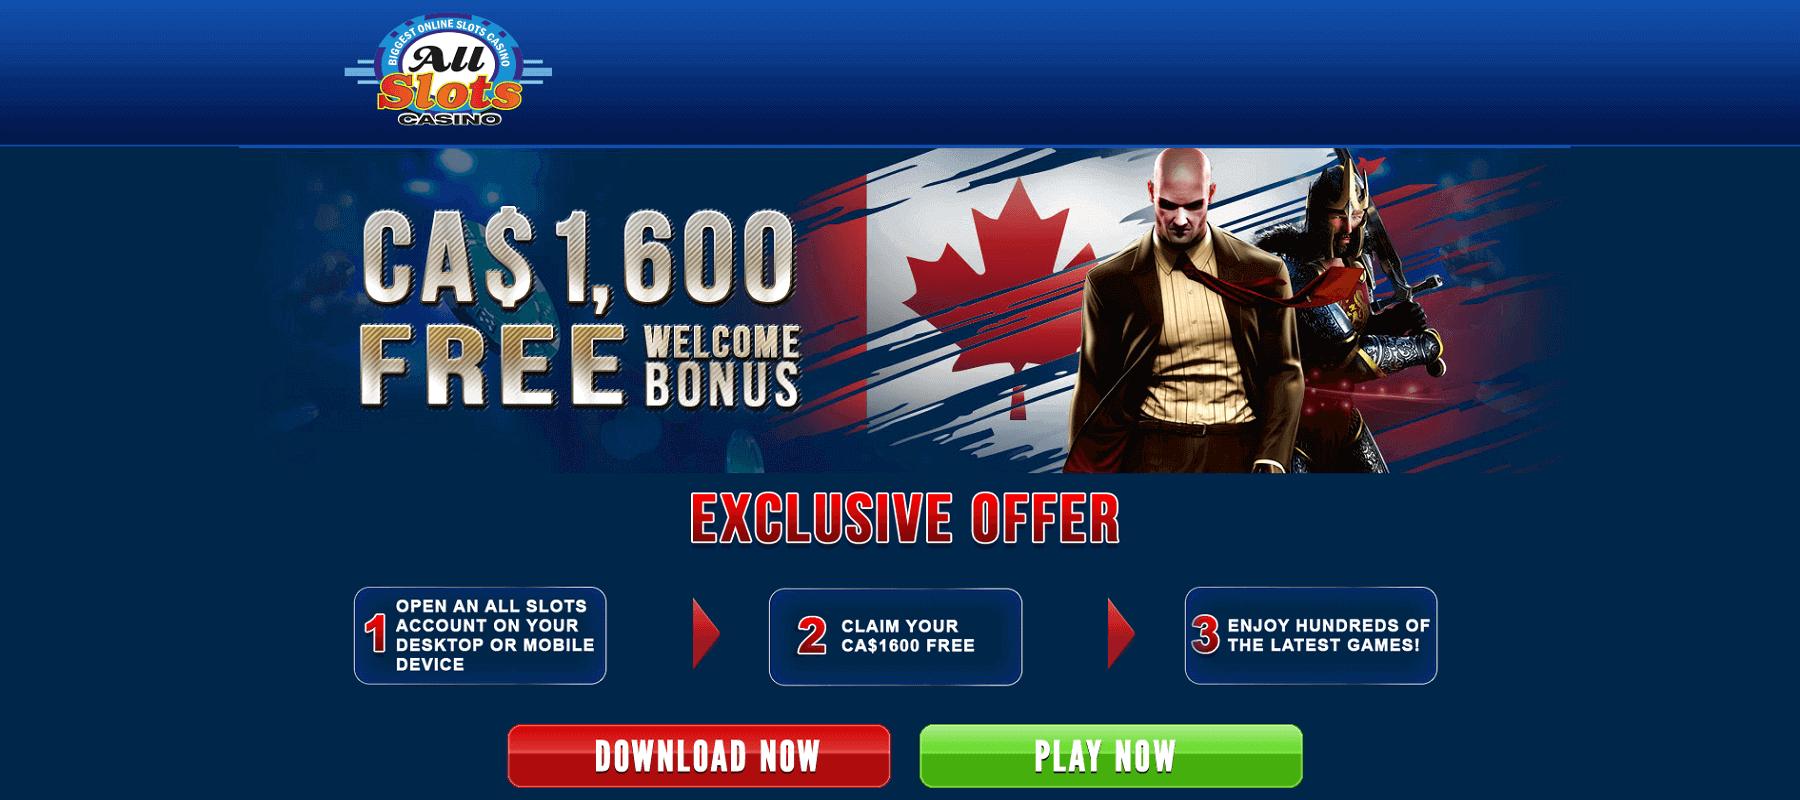 All Slots CA$1,600 Welcome Bonus Screenshot